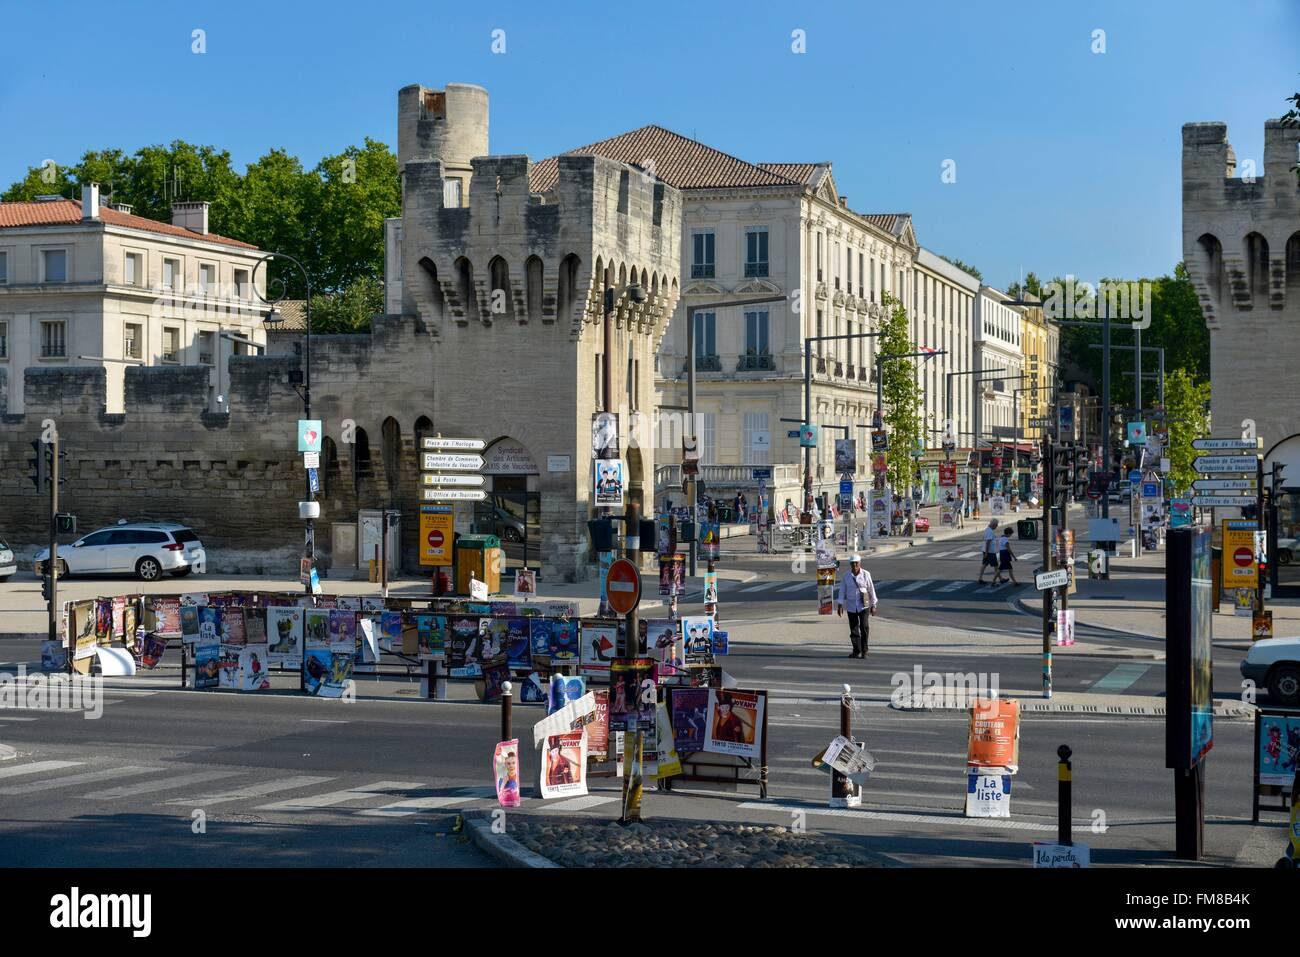 France, Vaucluse, Avignon, Republic Gate, Avignon Festival, fly posting on the street furniture on a boulevard - Stock Image